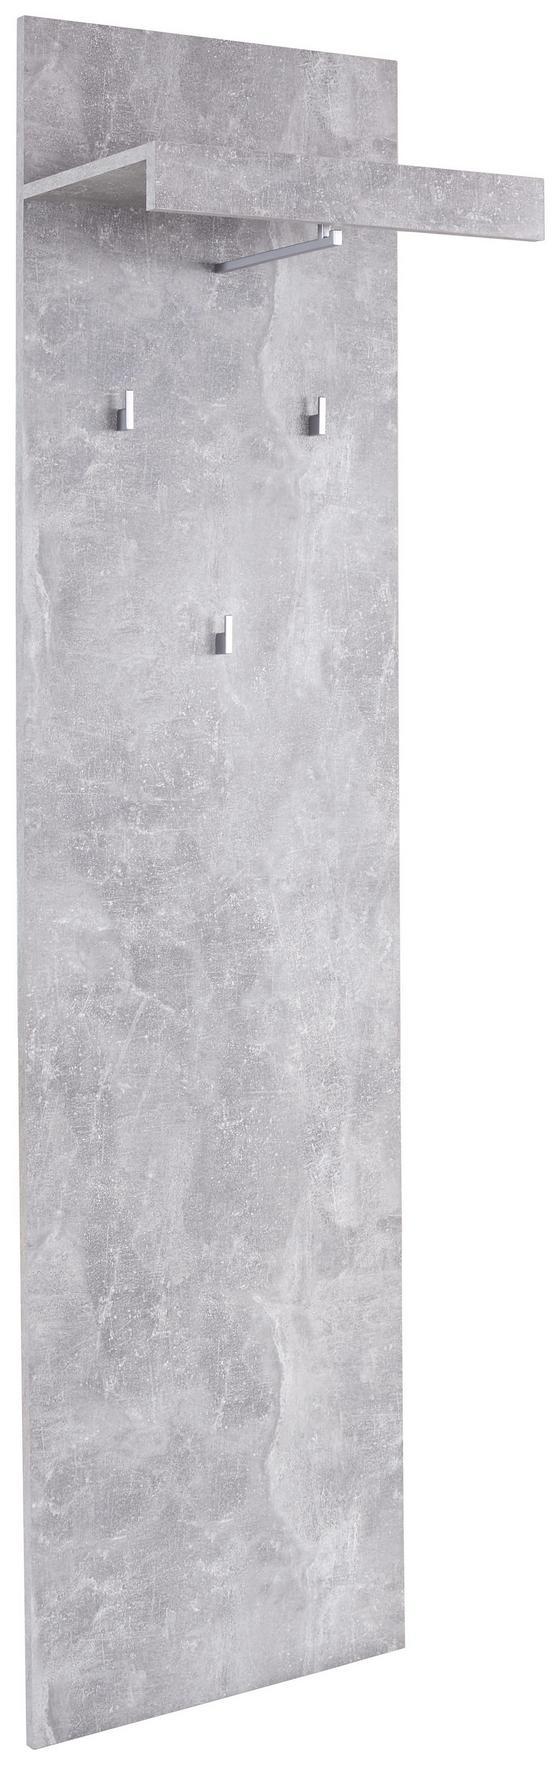 Garderobenpaneel Malta - Grau, MODERN, Holzwerkstoff (50/195,4/28,2cm)